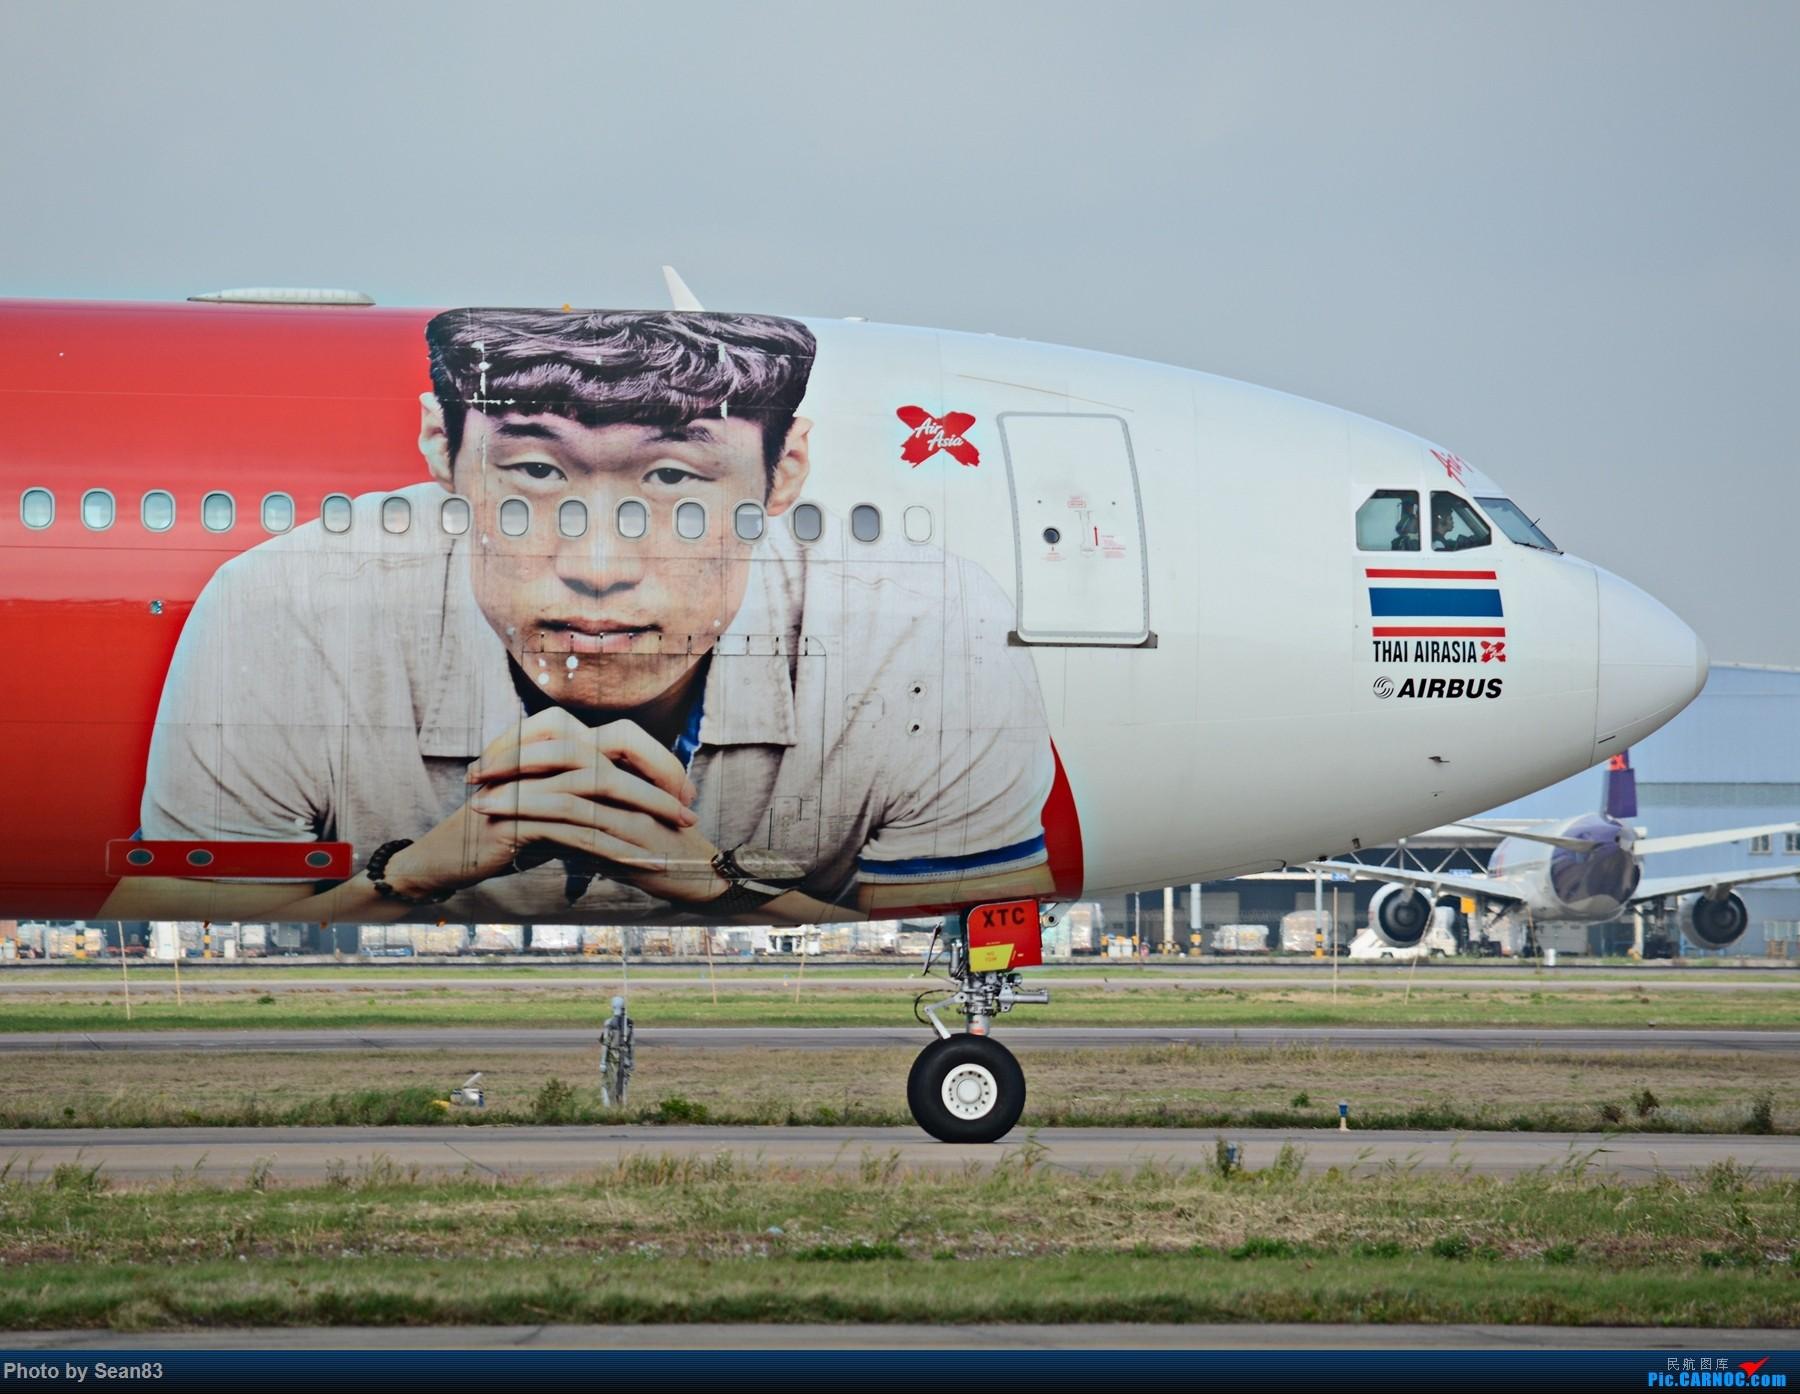 Re:[原创](PVG1800*)亚航 朴队长彩绘 清晨降落,有大头照 AIRBUS A330-300 HS-XTC 上海浦东国际机场